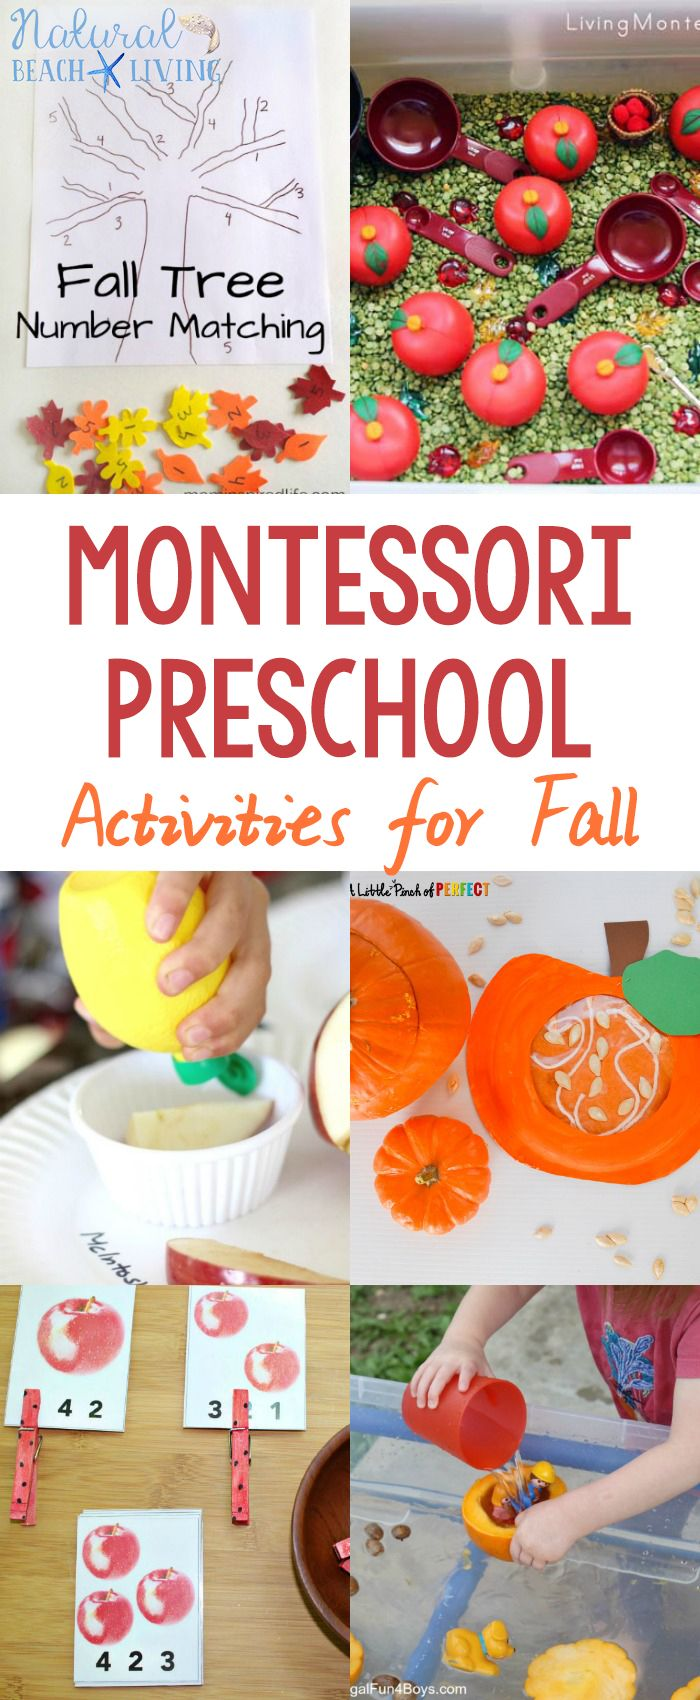 30+ Amazing Montessori Fall Activities for Preschool and Kindergarten, Montessori Fall Practical Life, Montessori Books, Montessori Printables, Montessori Themes